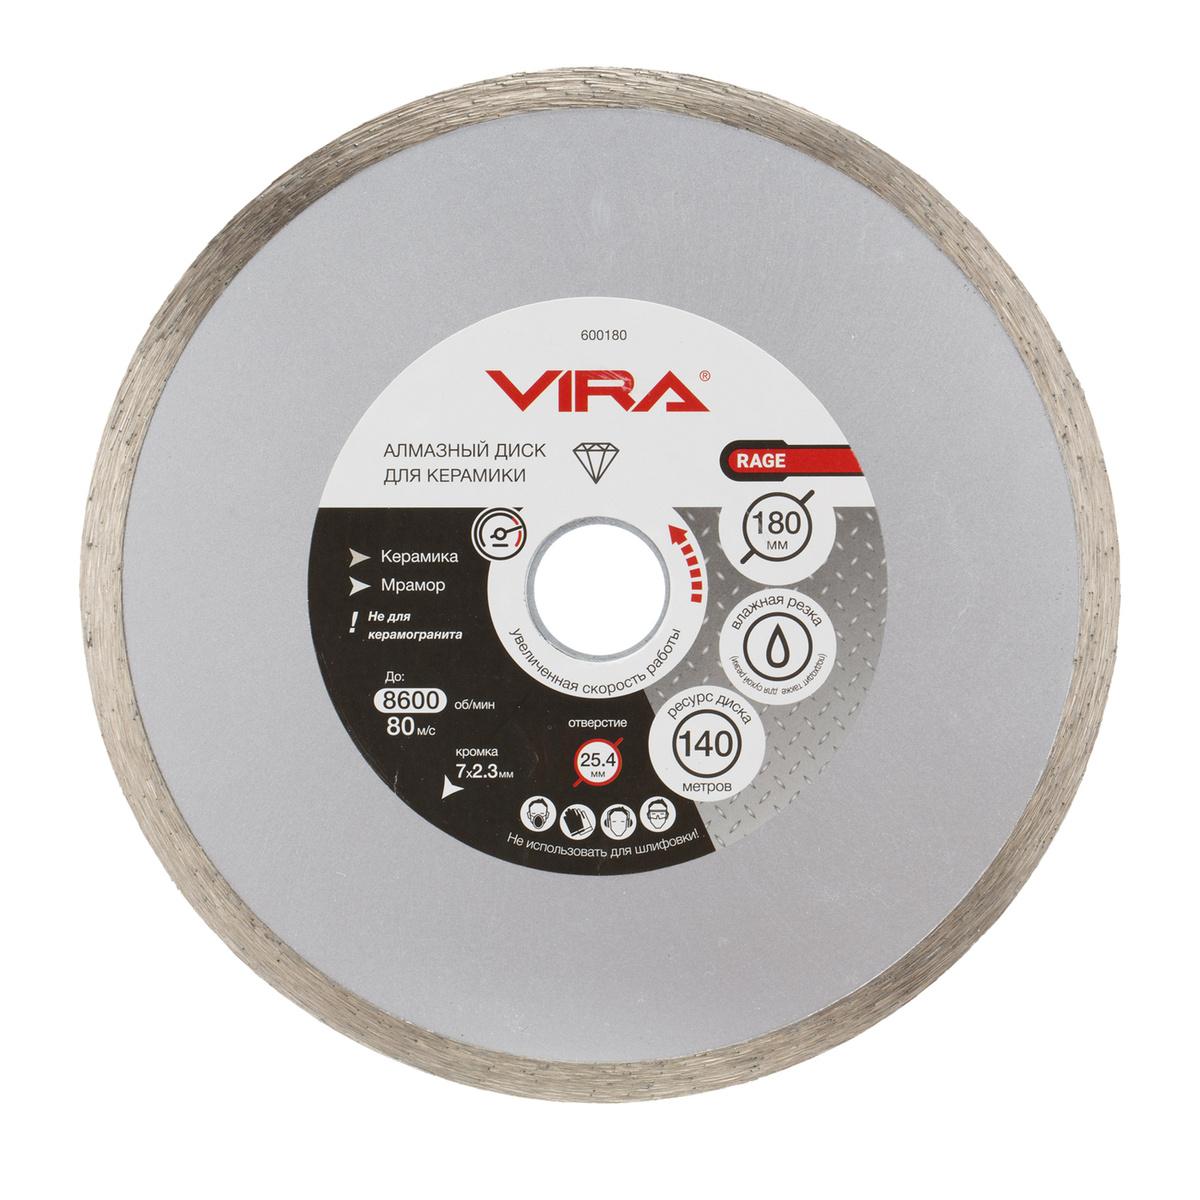 Диск алмазный Vira Rage 180 x 2,3 x 22, 25 #1